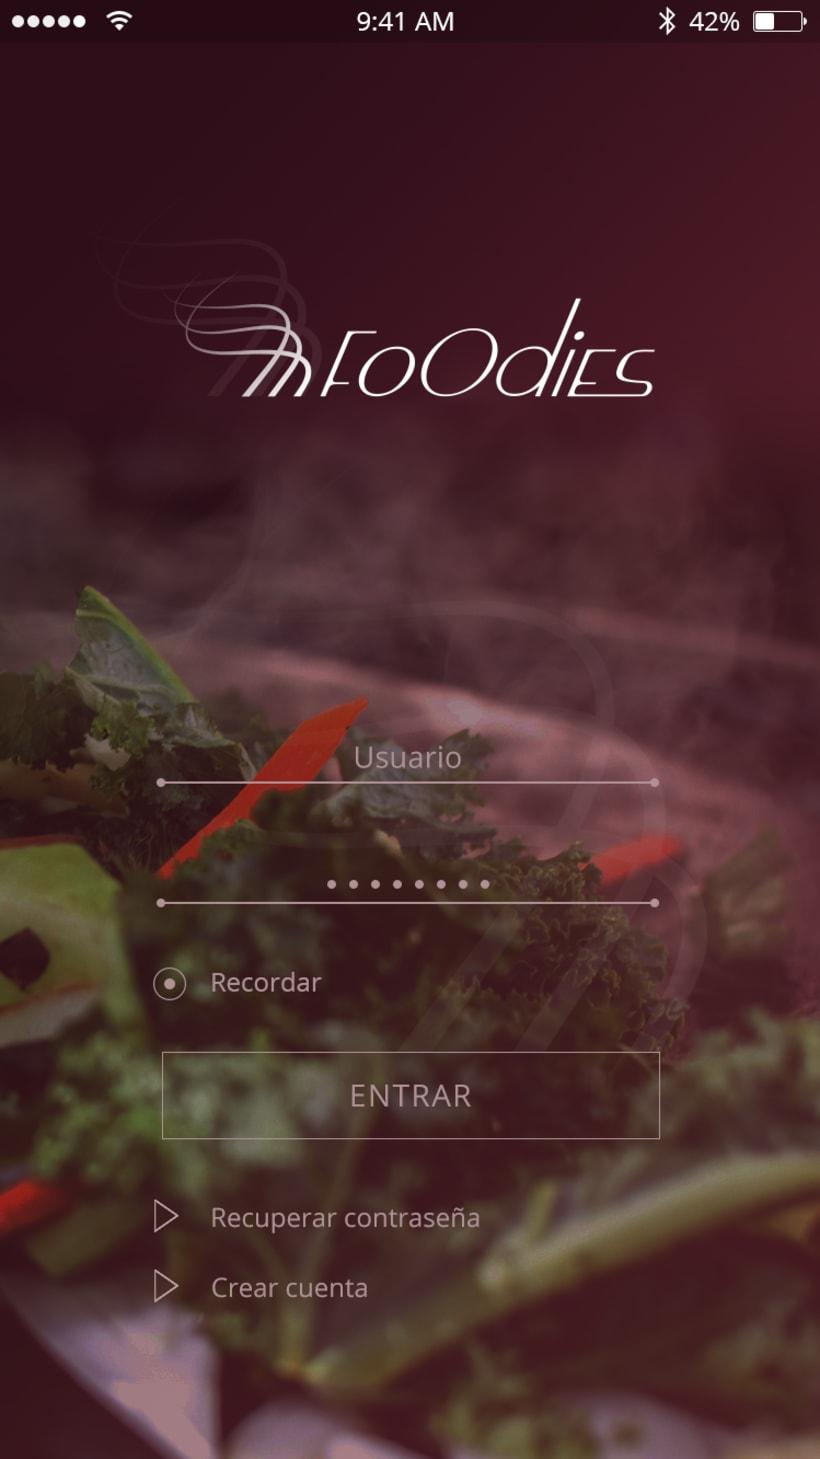 App ID, UX/UI, promo 8